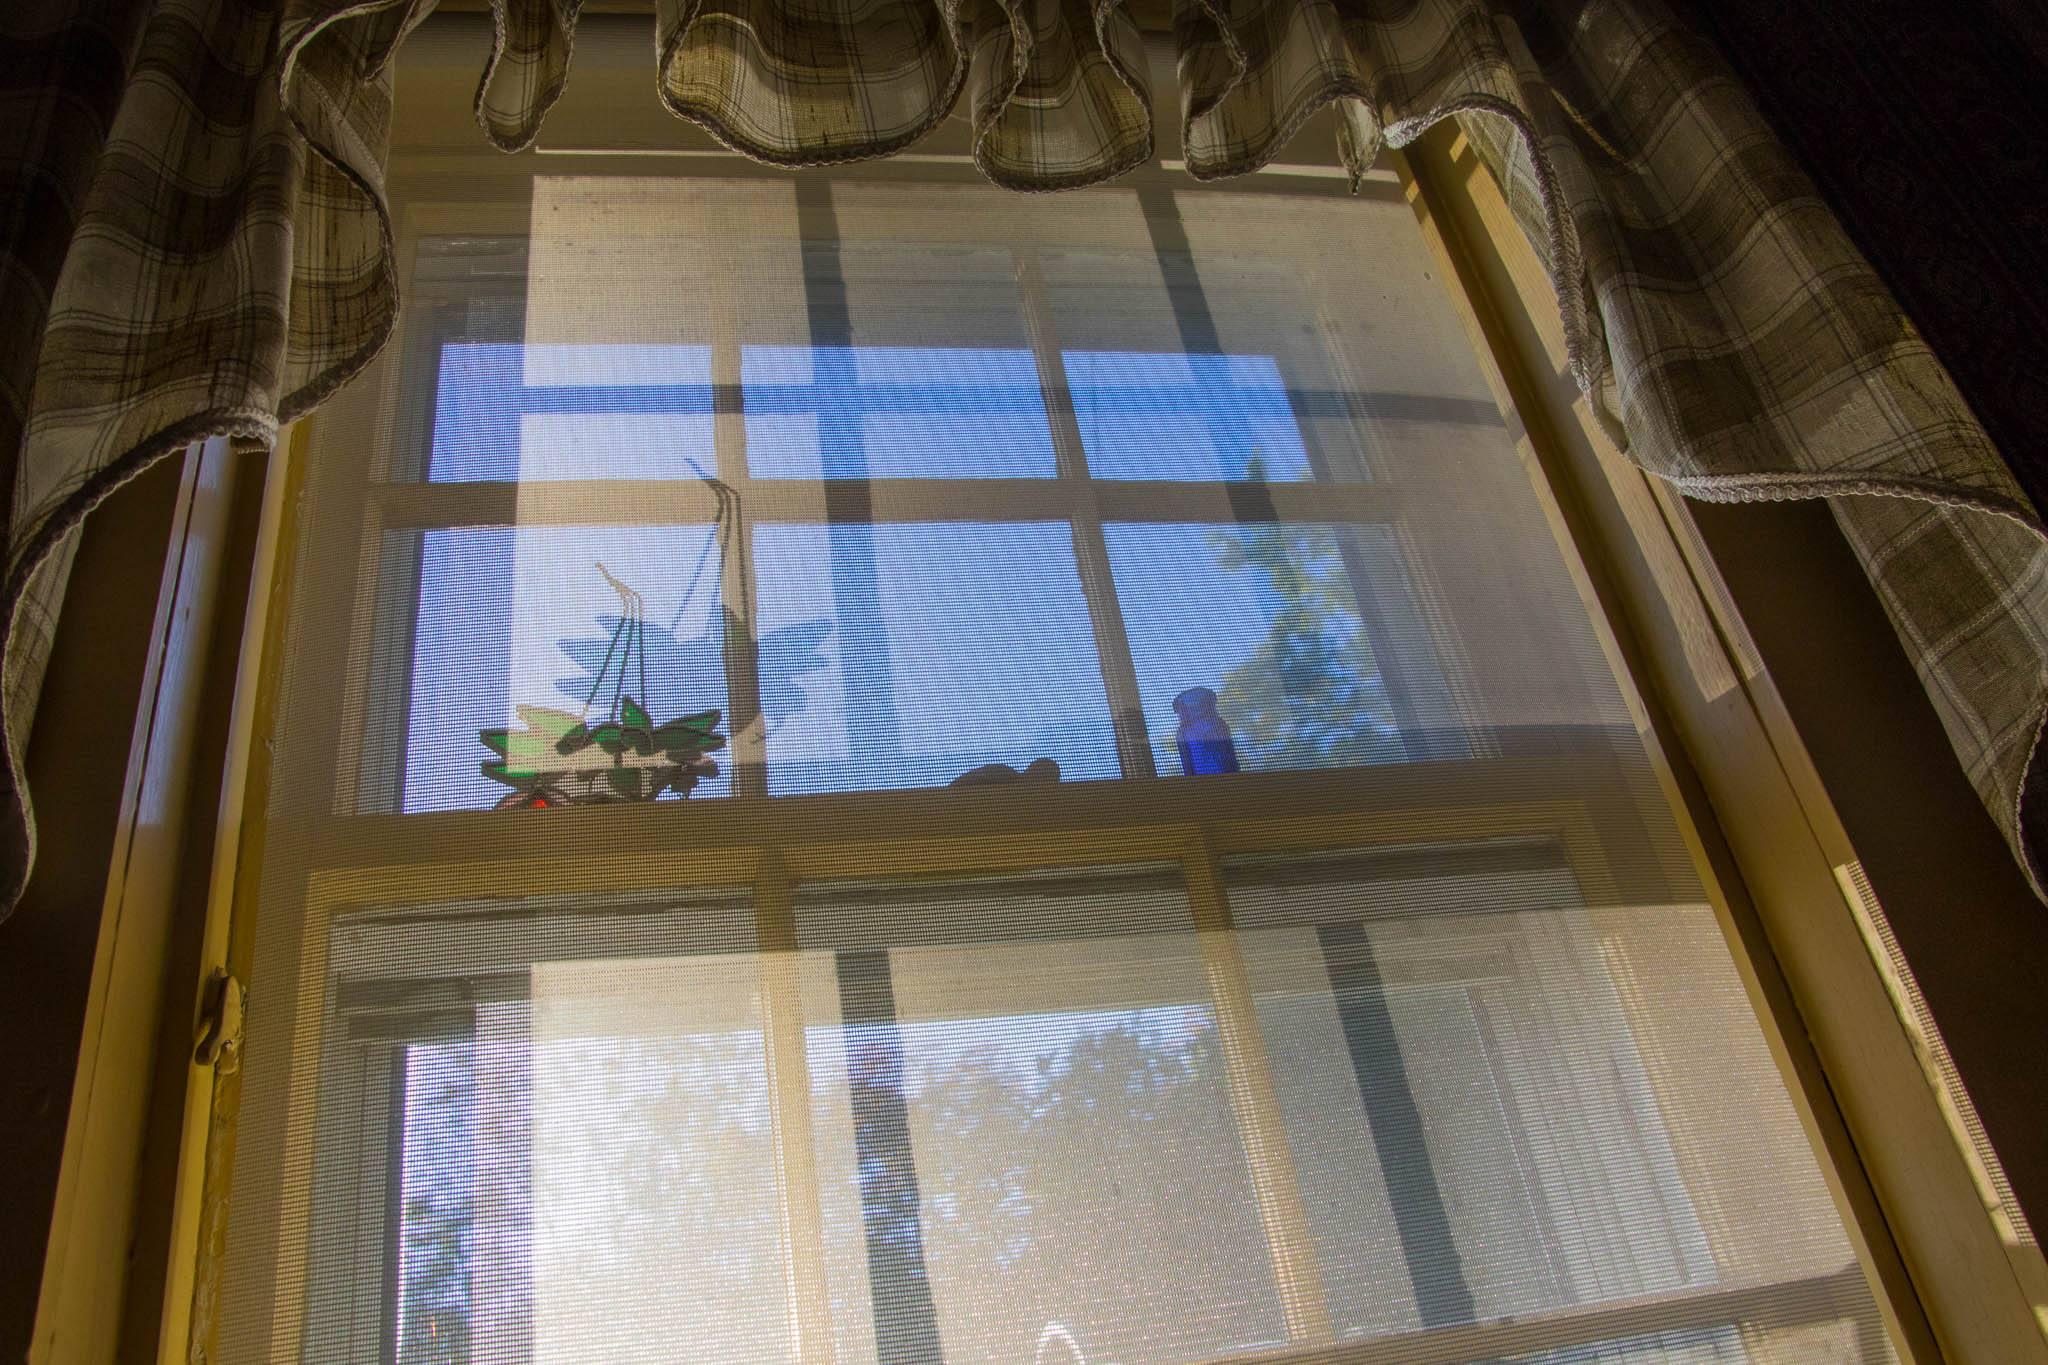 WindowSummer